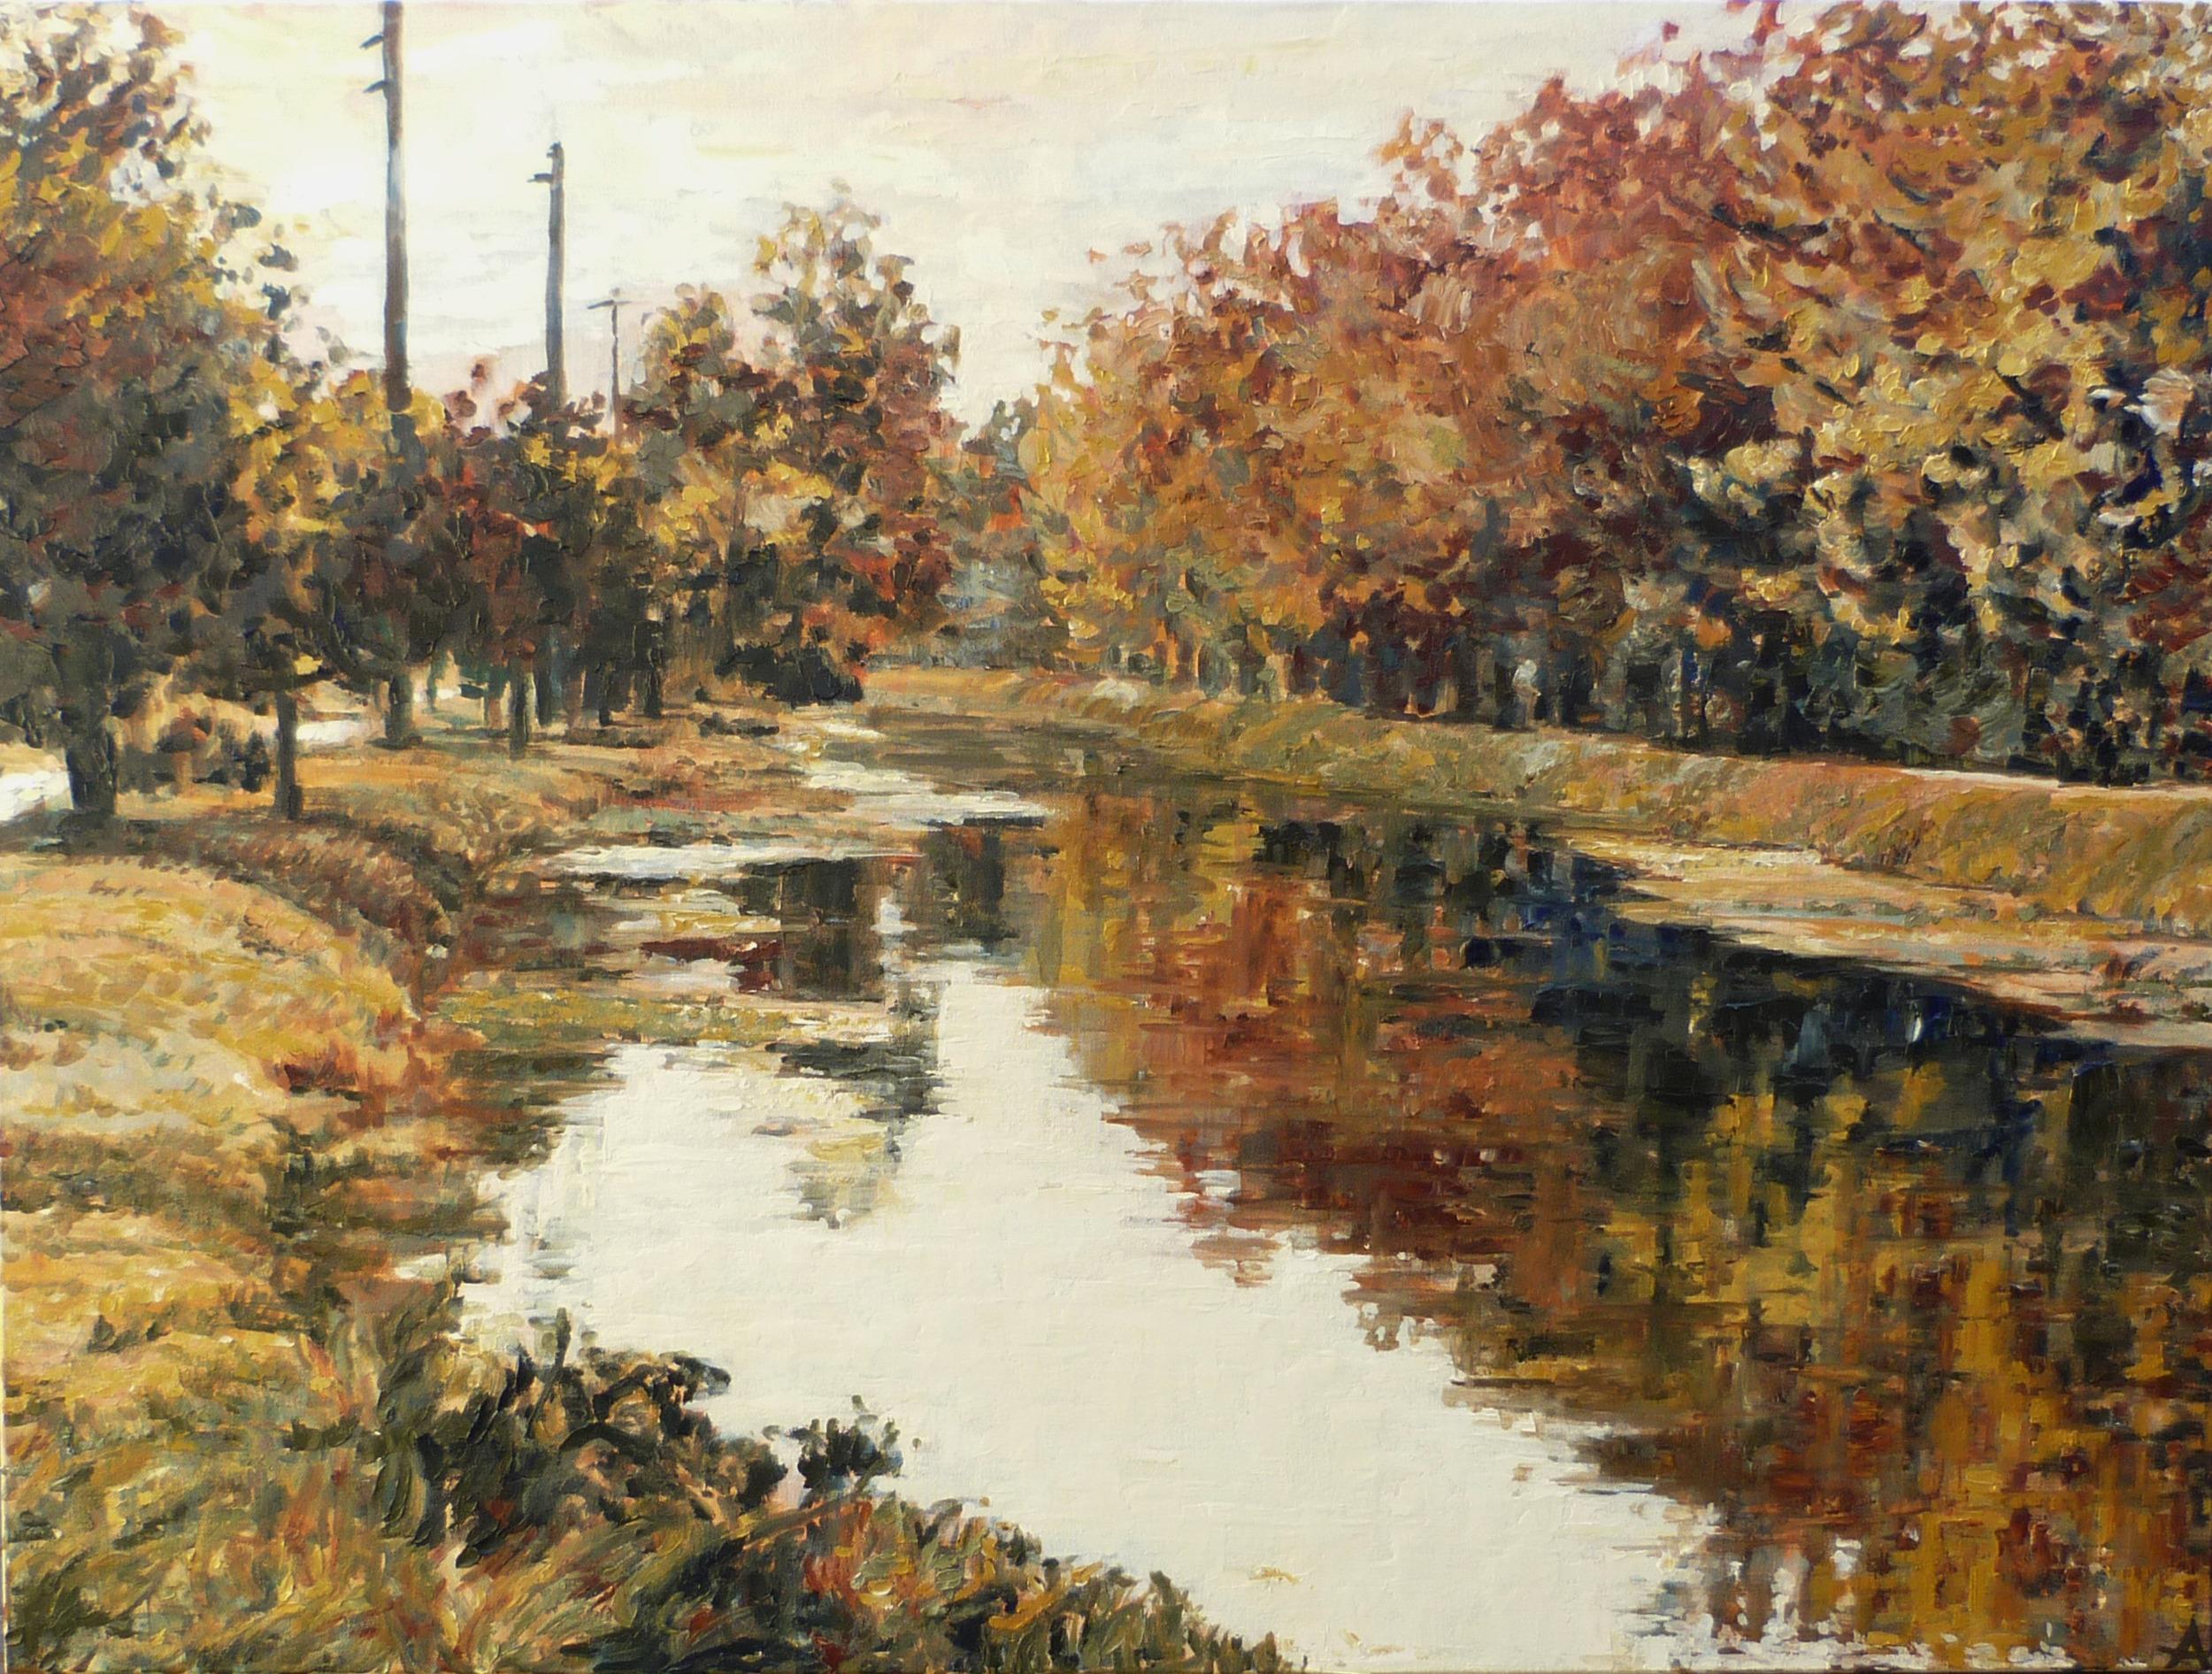 "SOLD, Autumn in Indianapolis, Copyright 2013 Hirschten, Oil on Canvas, 30"" x 40"""